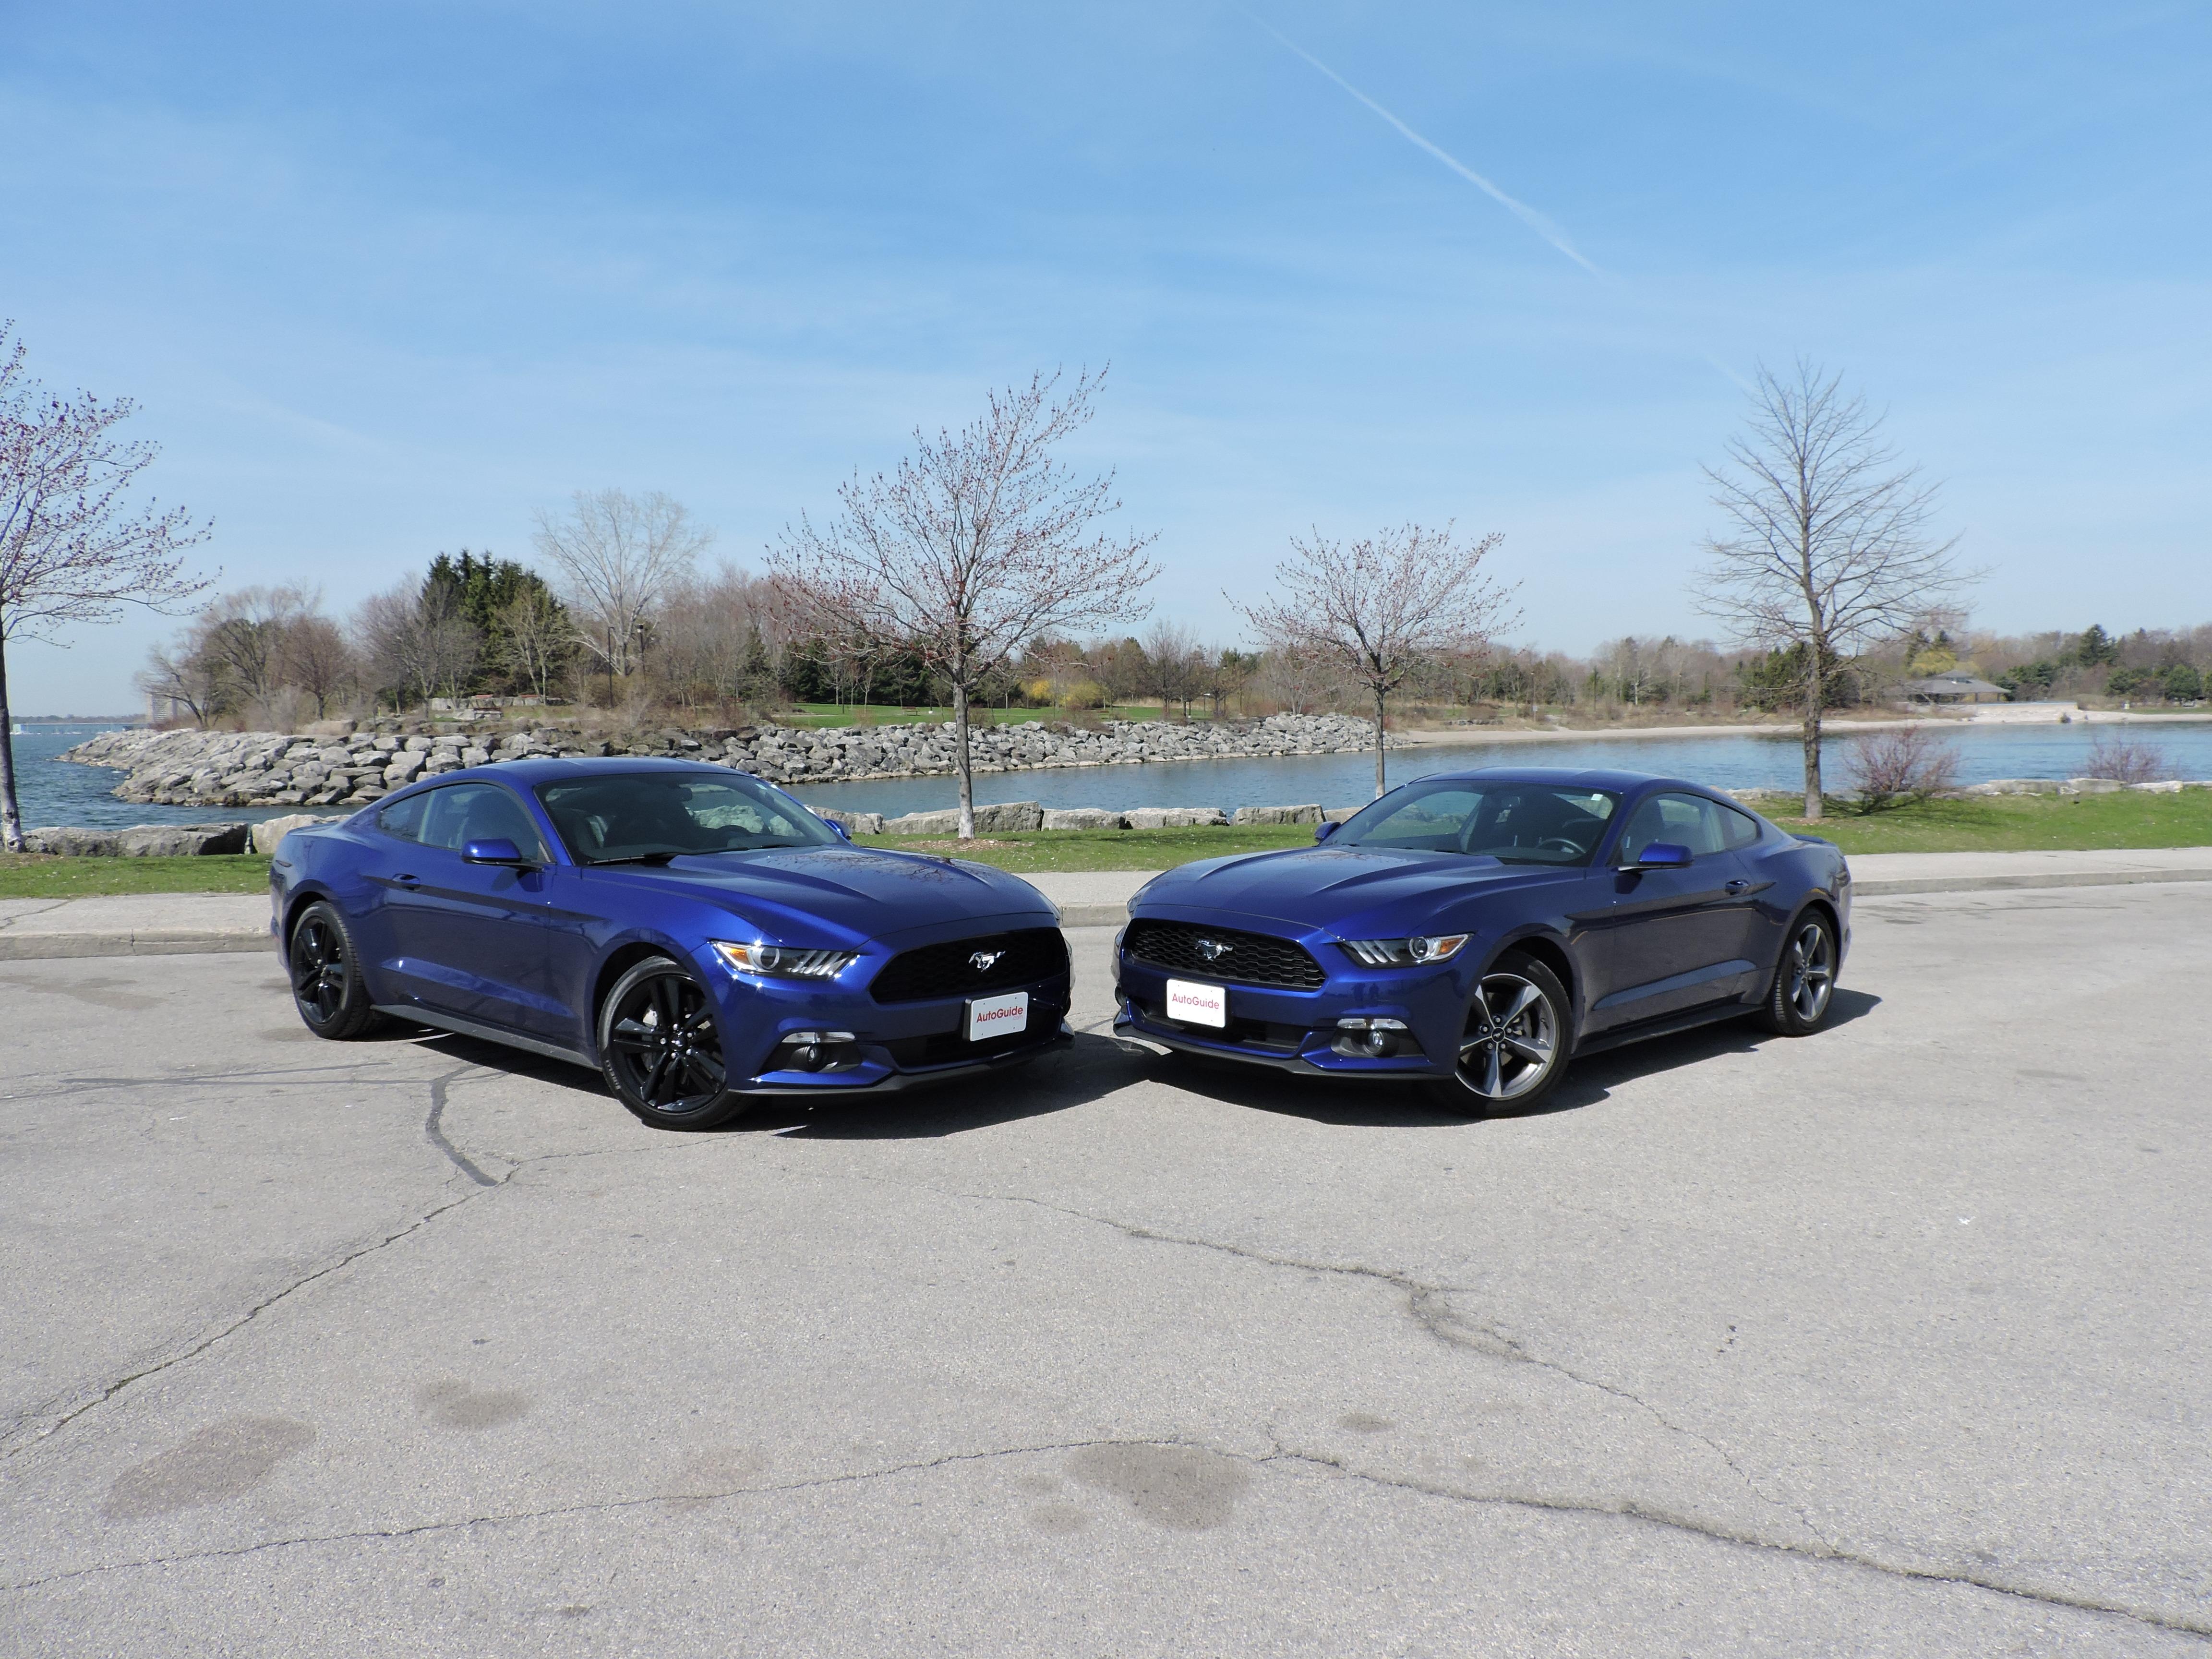 2014 V6 Camero or Mustang?